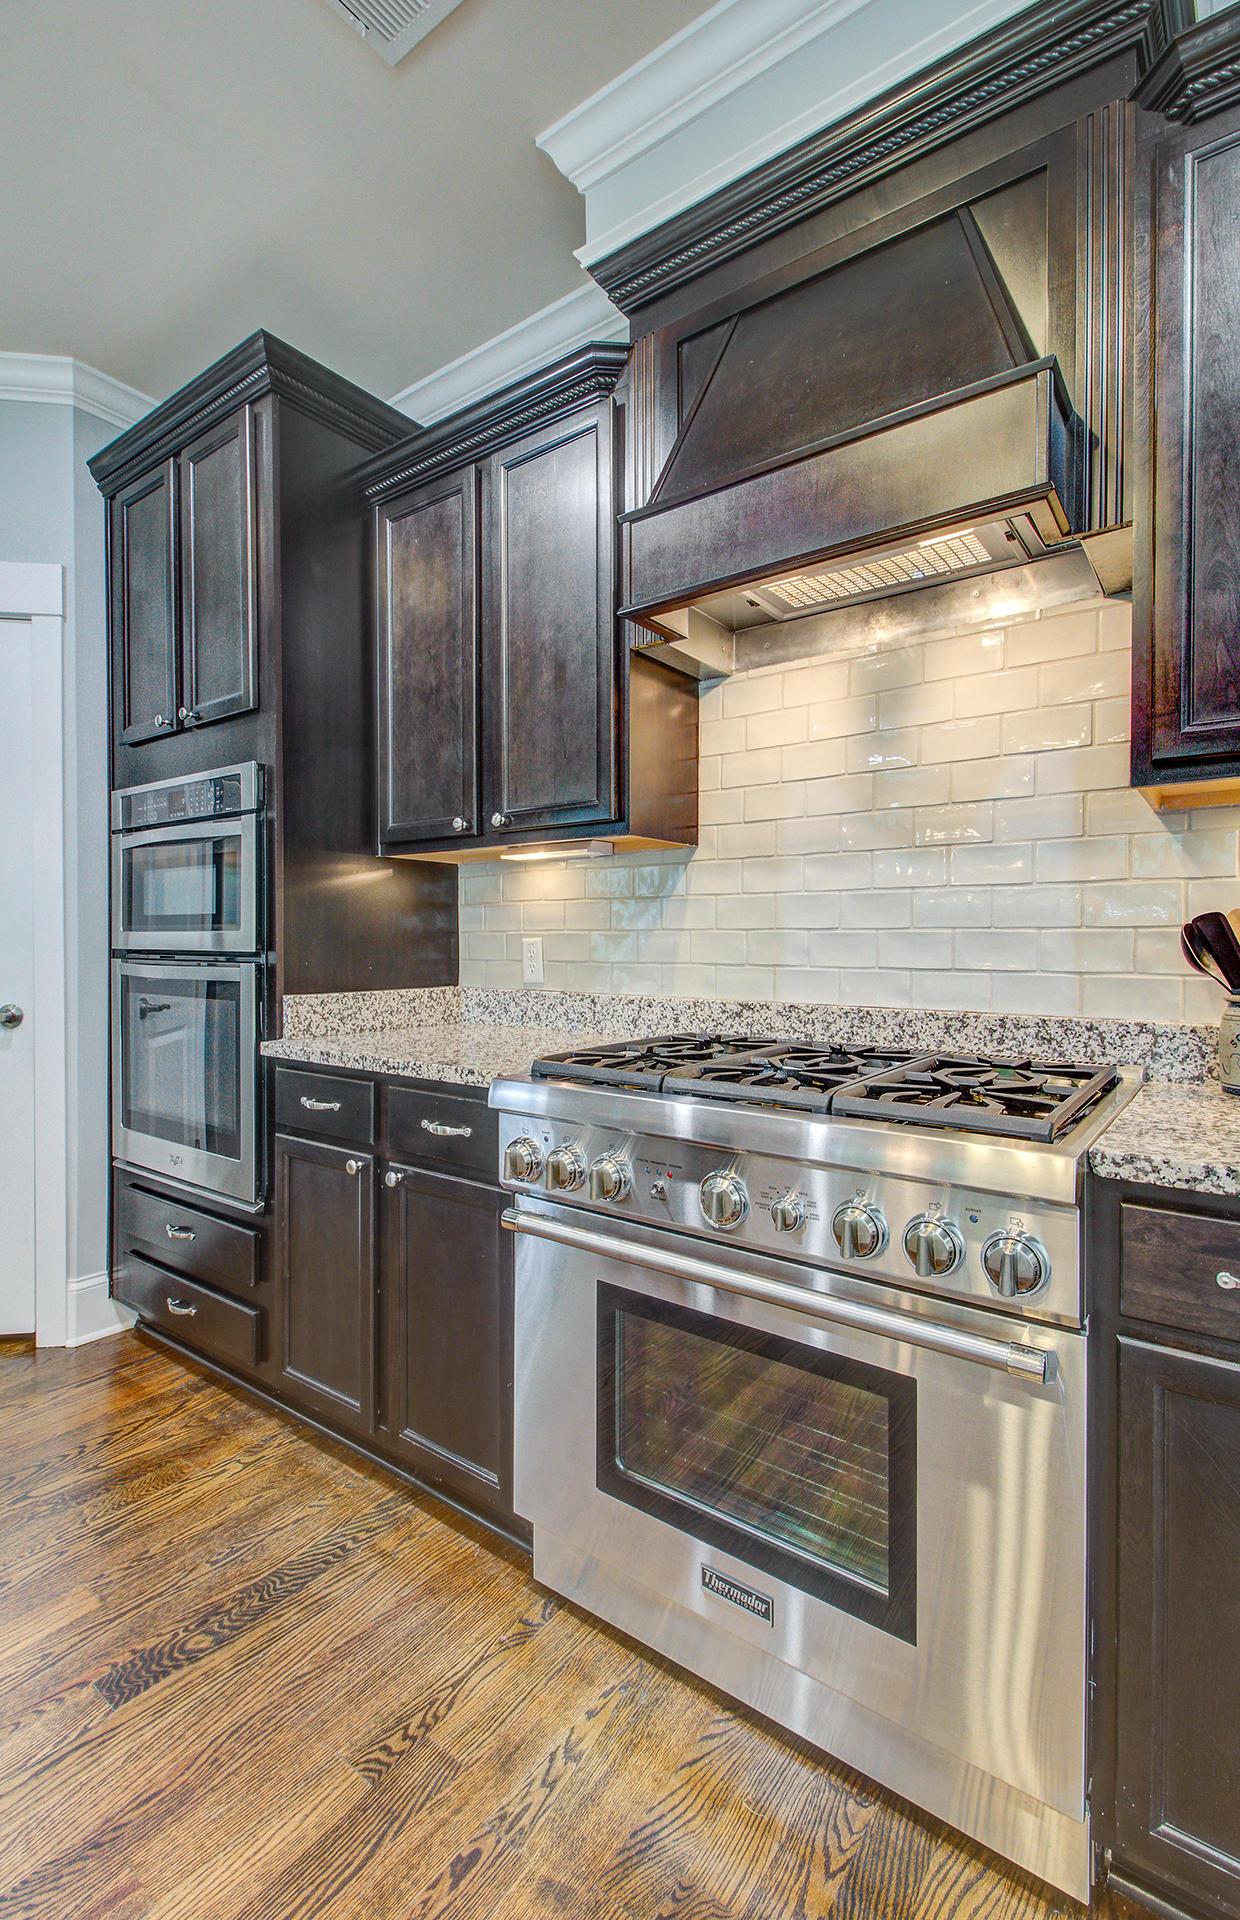 Scotts Creek Homes For Sale - 1404 Scotts Creek, Mount Pleasant, SC - 30